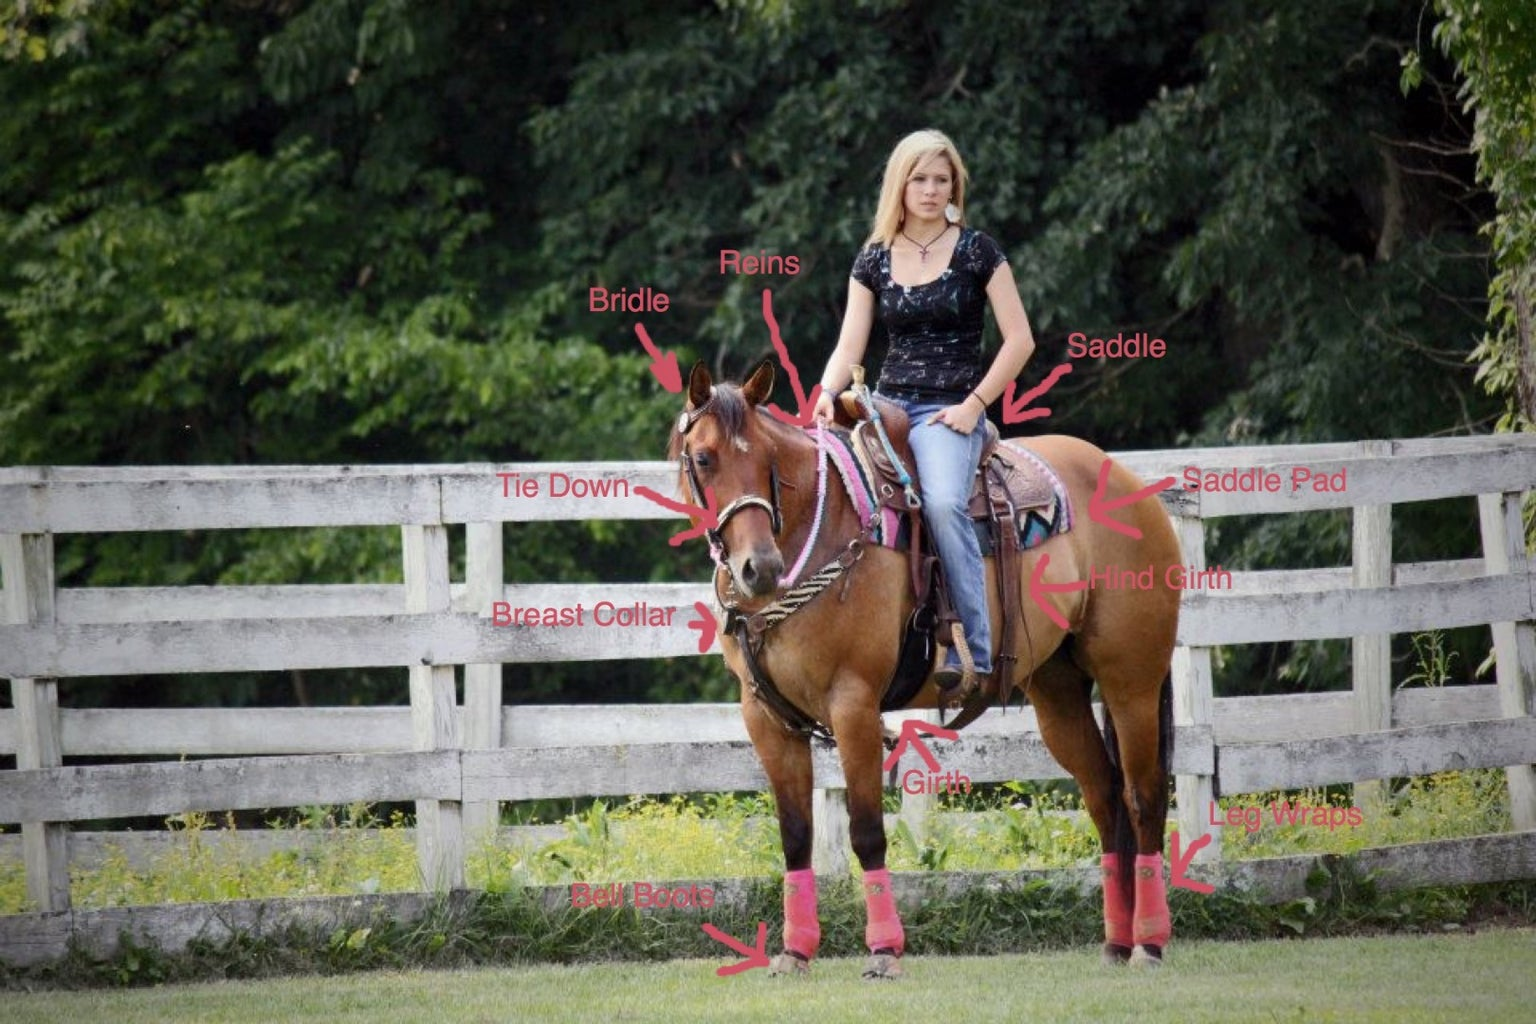 Saddling a Western Horse